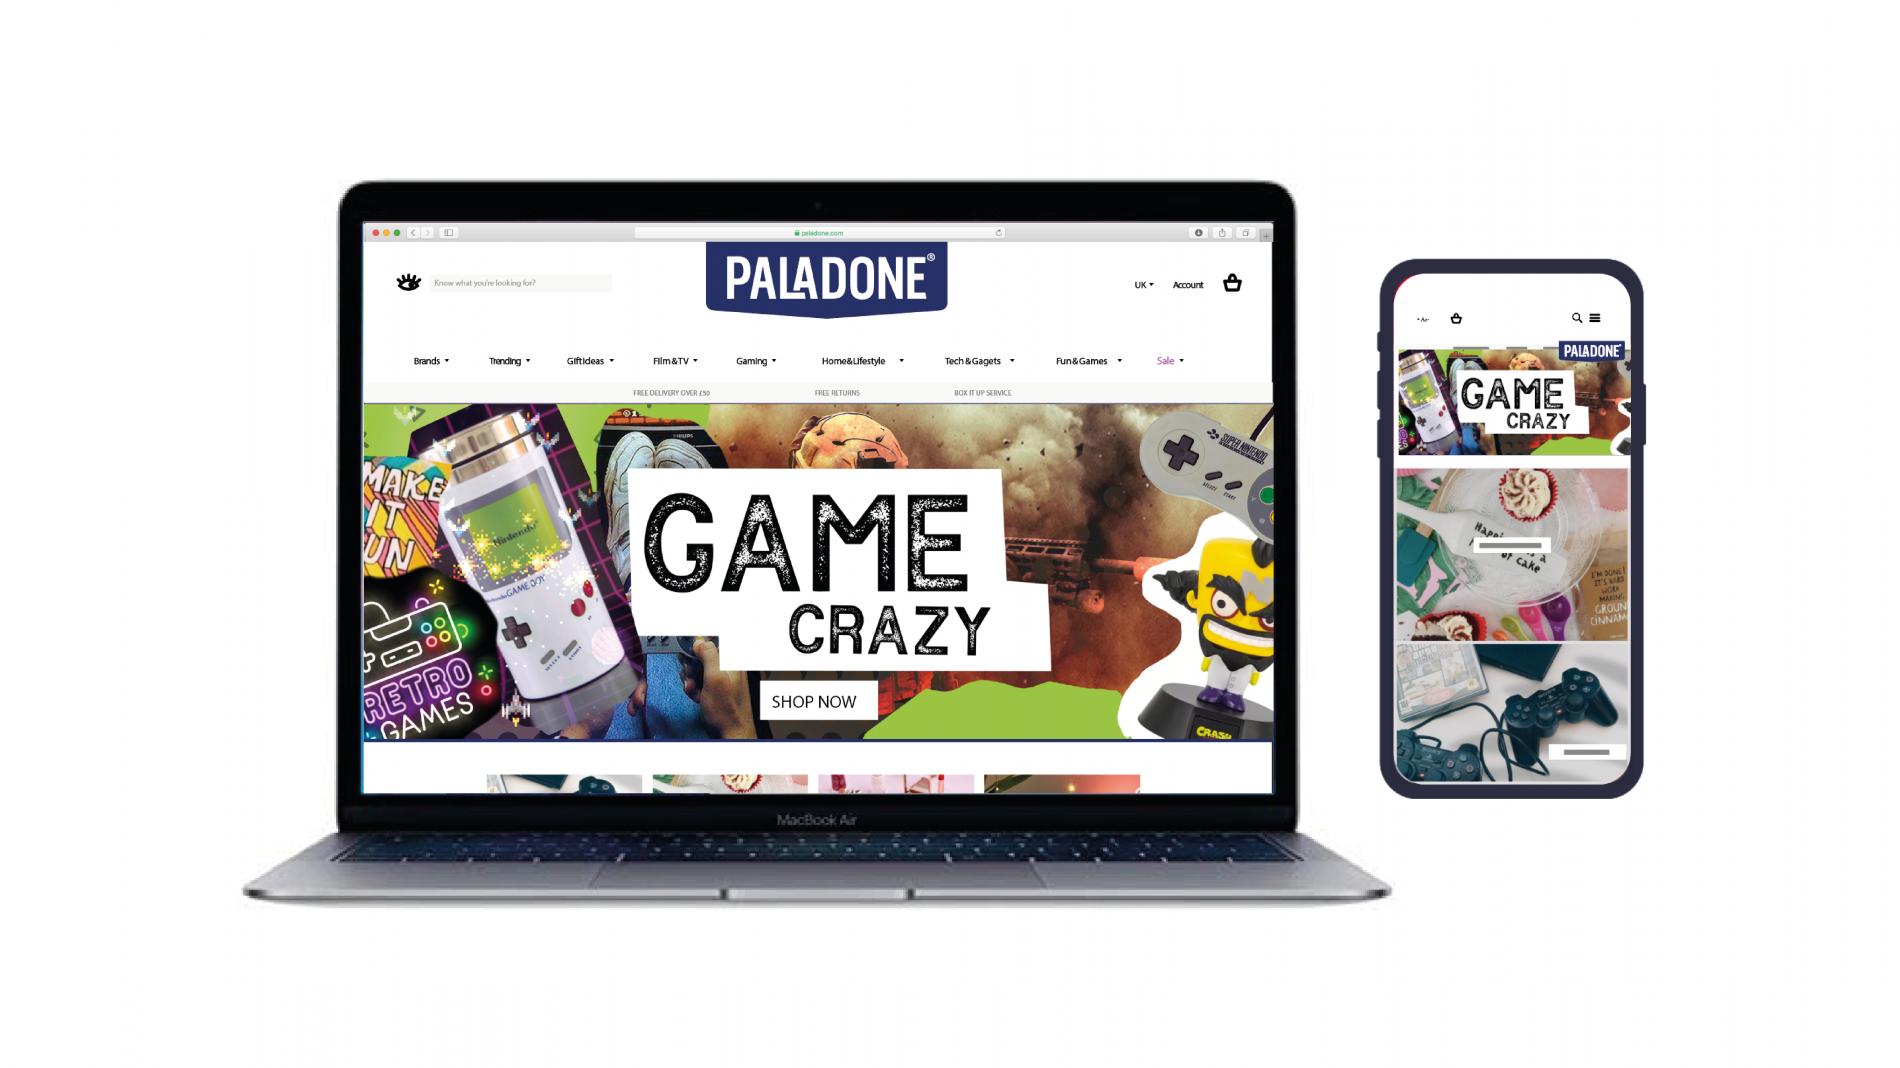 Paladone website and digital assets